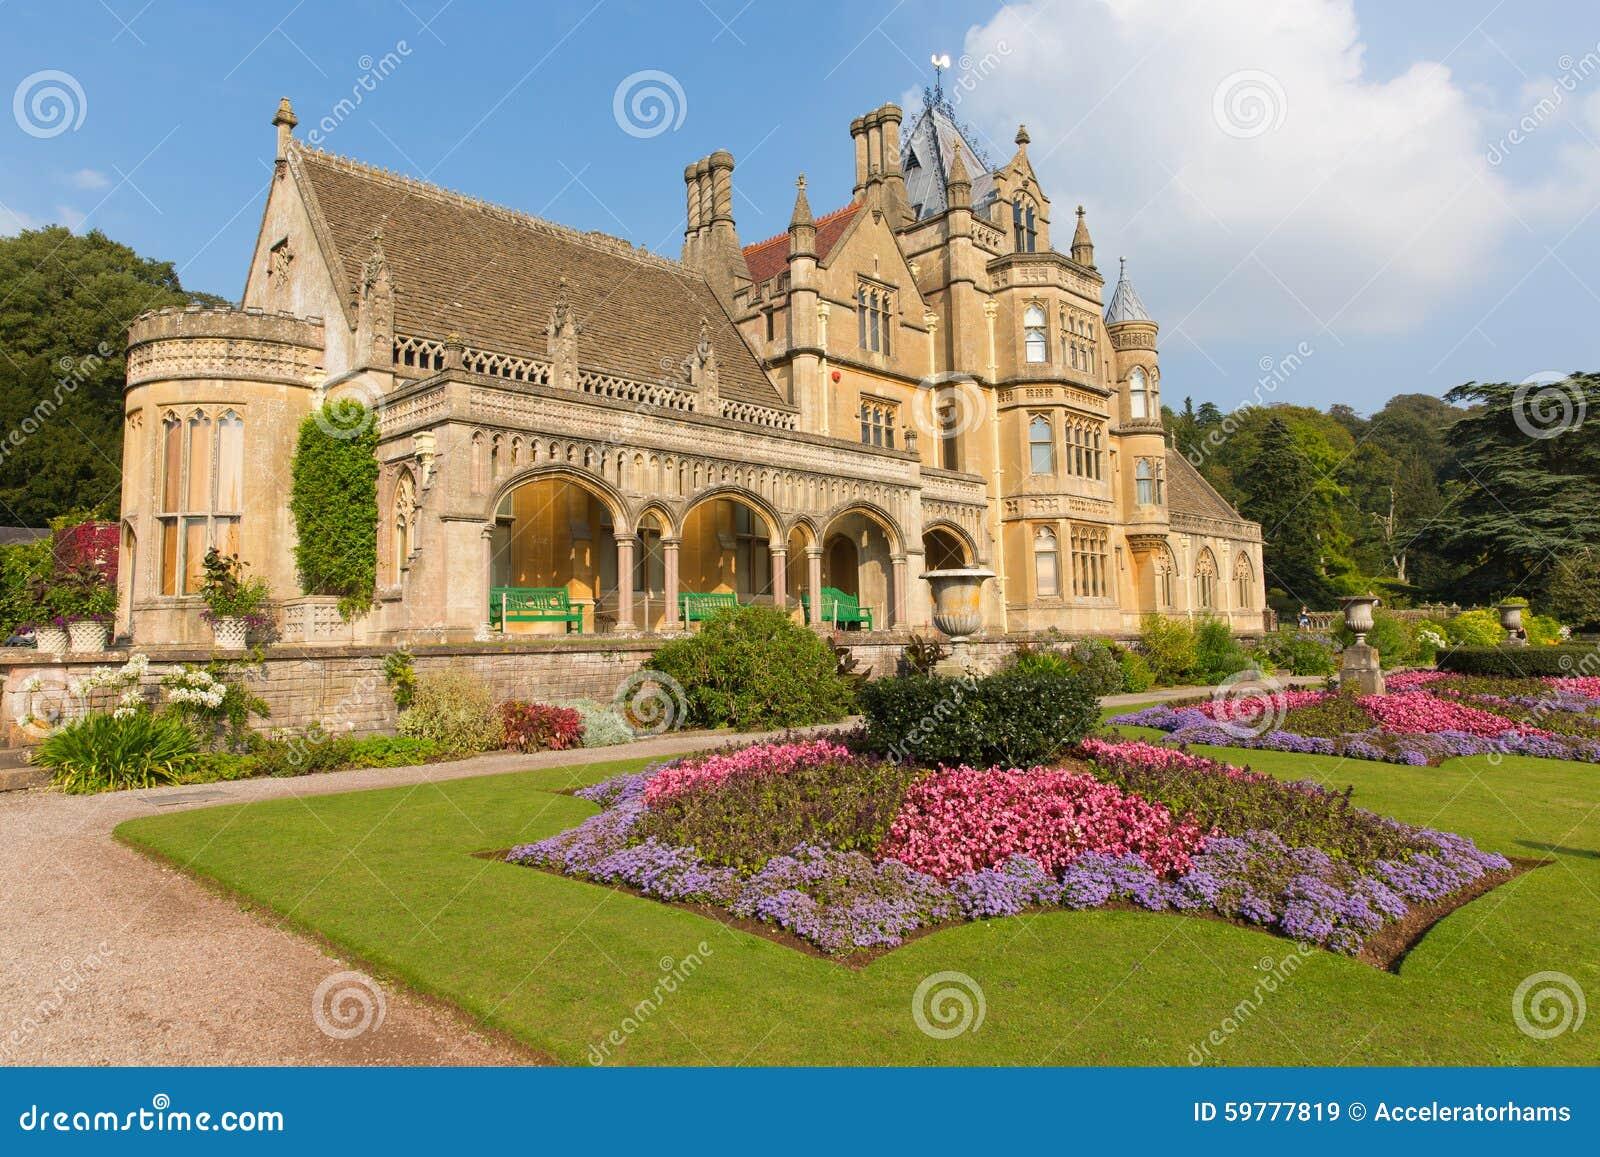 Tyntesfield House Wraxhall North Somerset England UK Victorian